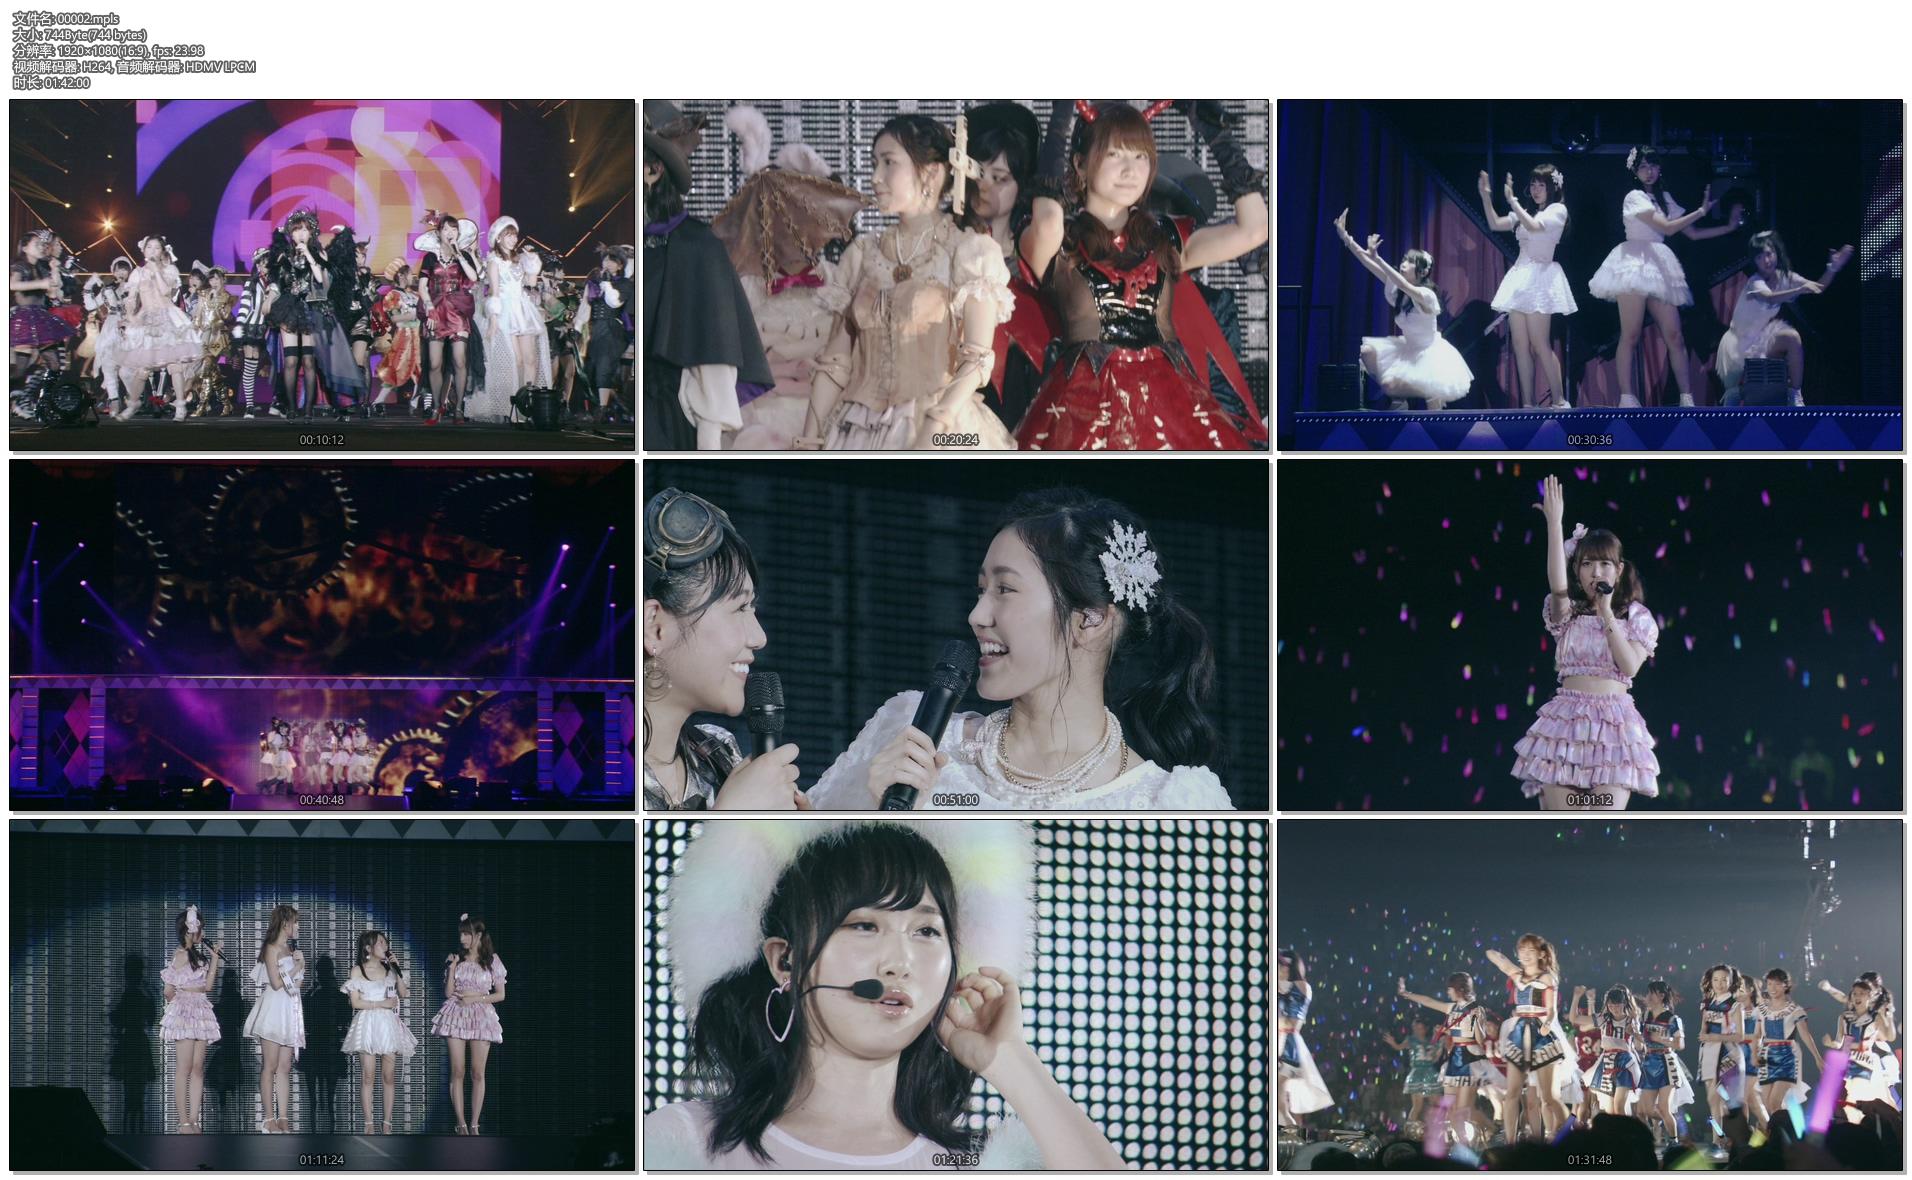 AKB48川荣李奈毕业演唱会 Manatsu no Solo Concert in Saitama Super Arena《BDMV 7碟 226G》蓝光原盘插图(4)